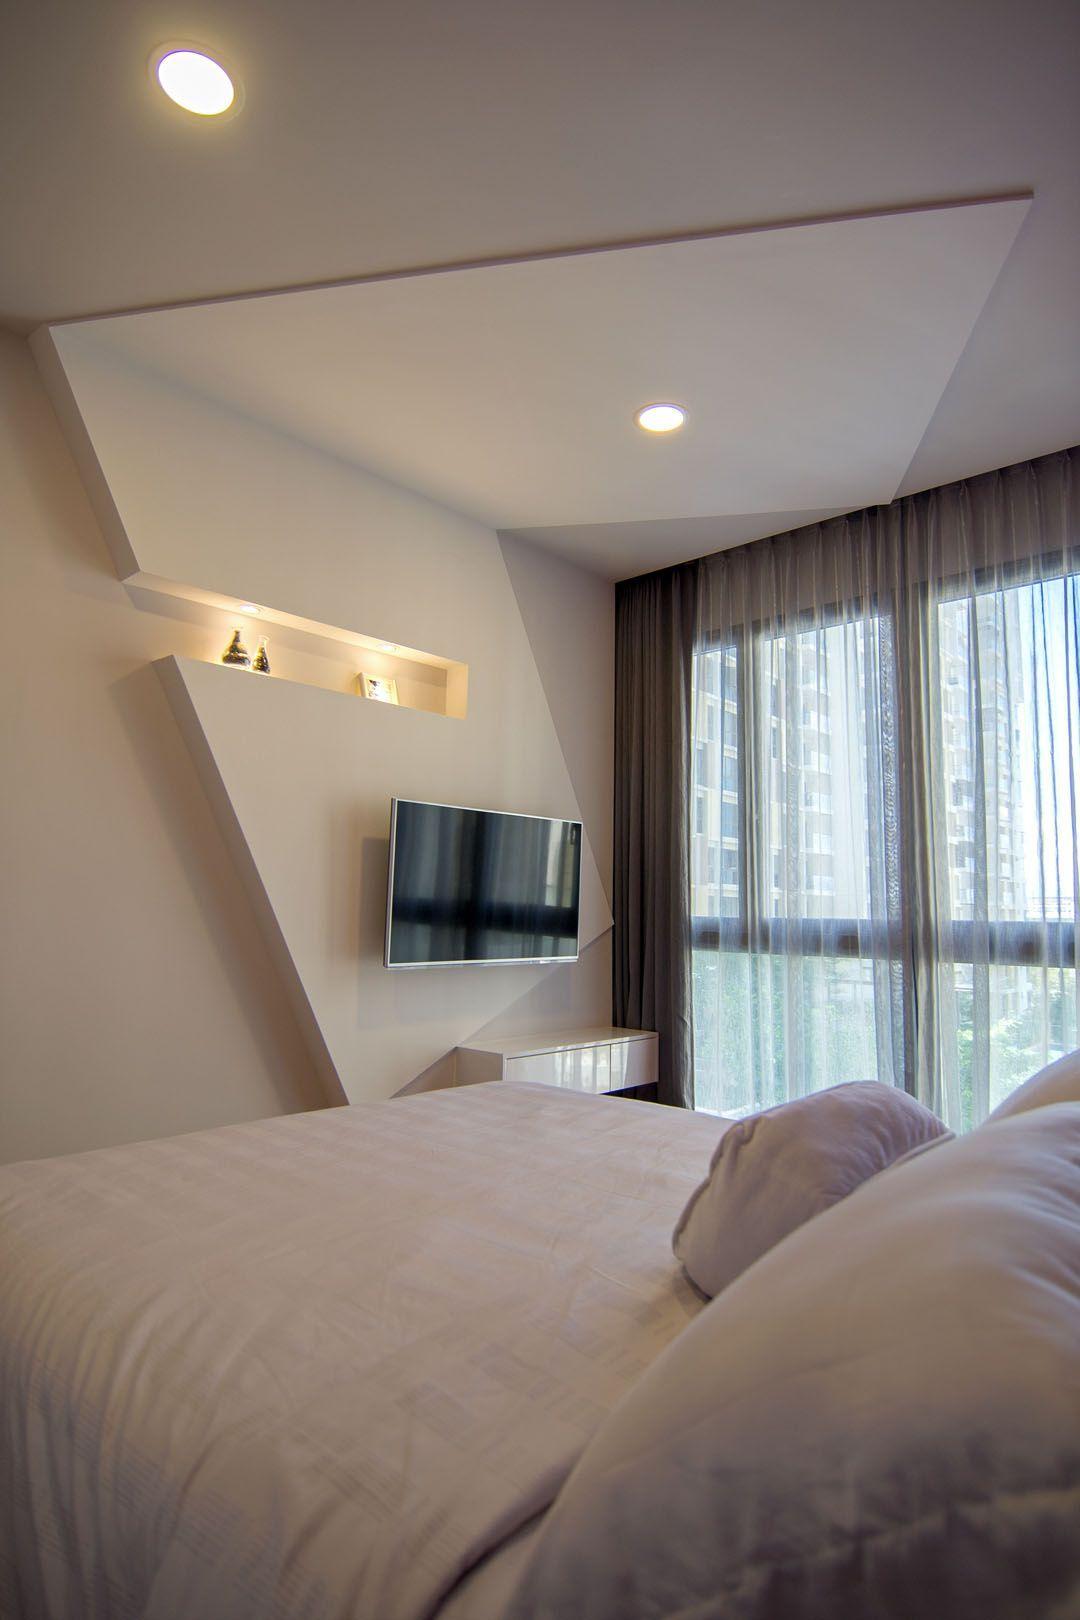 Asymmetrical Apartment Design With Undulating Surfaces In Singapore Via Bloglovin